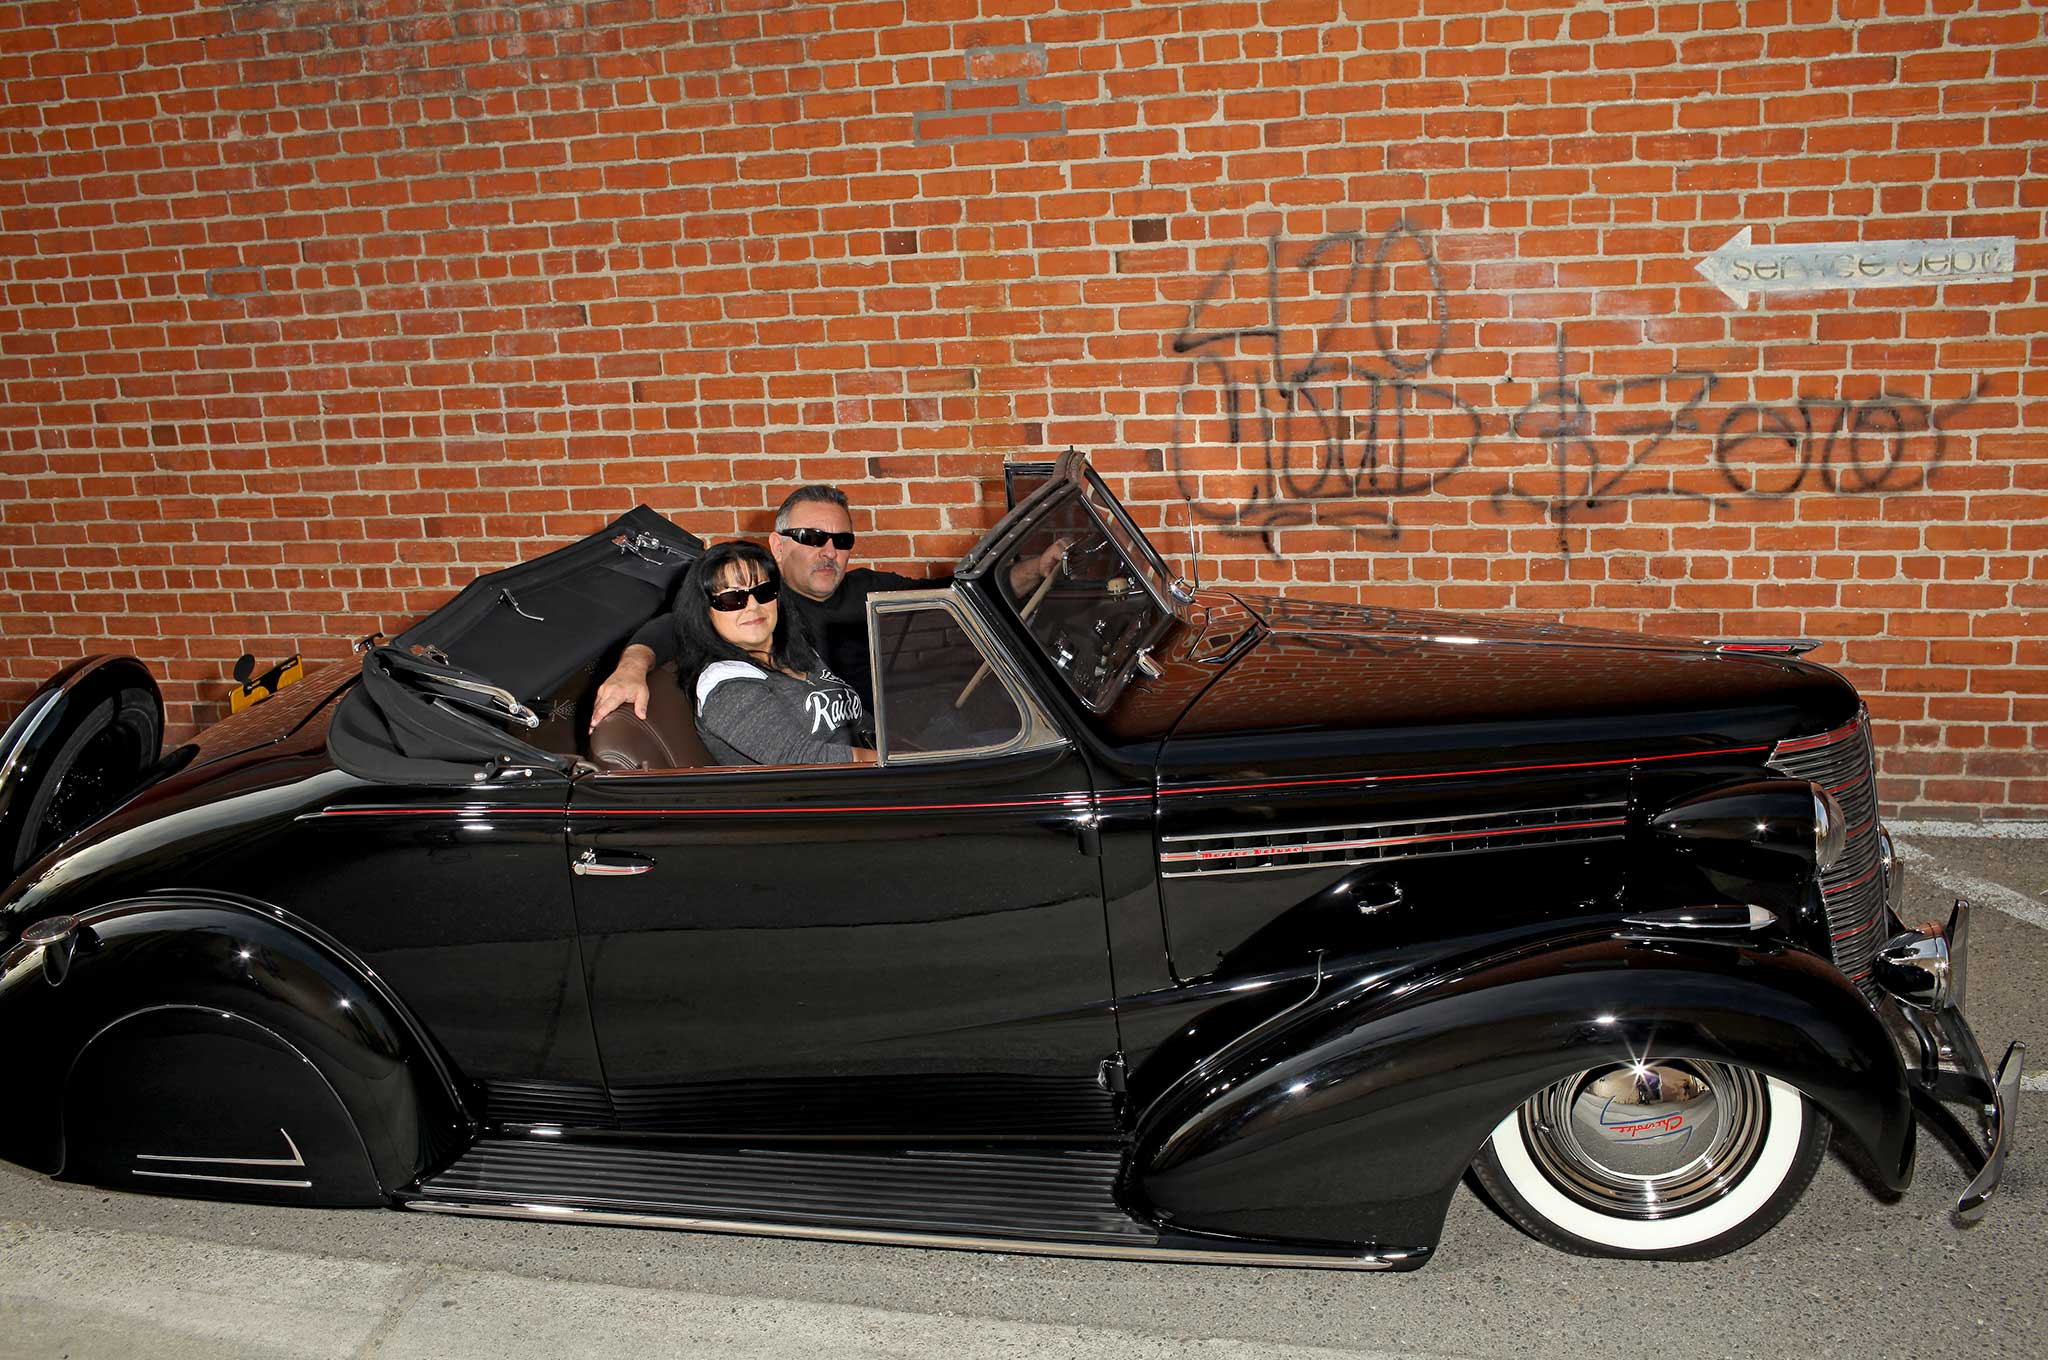 018 1938 chevrolet cabriolet duran family